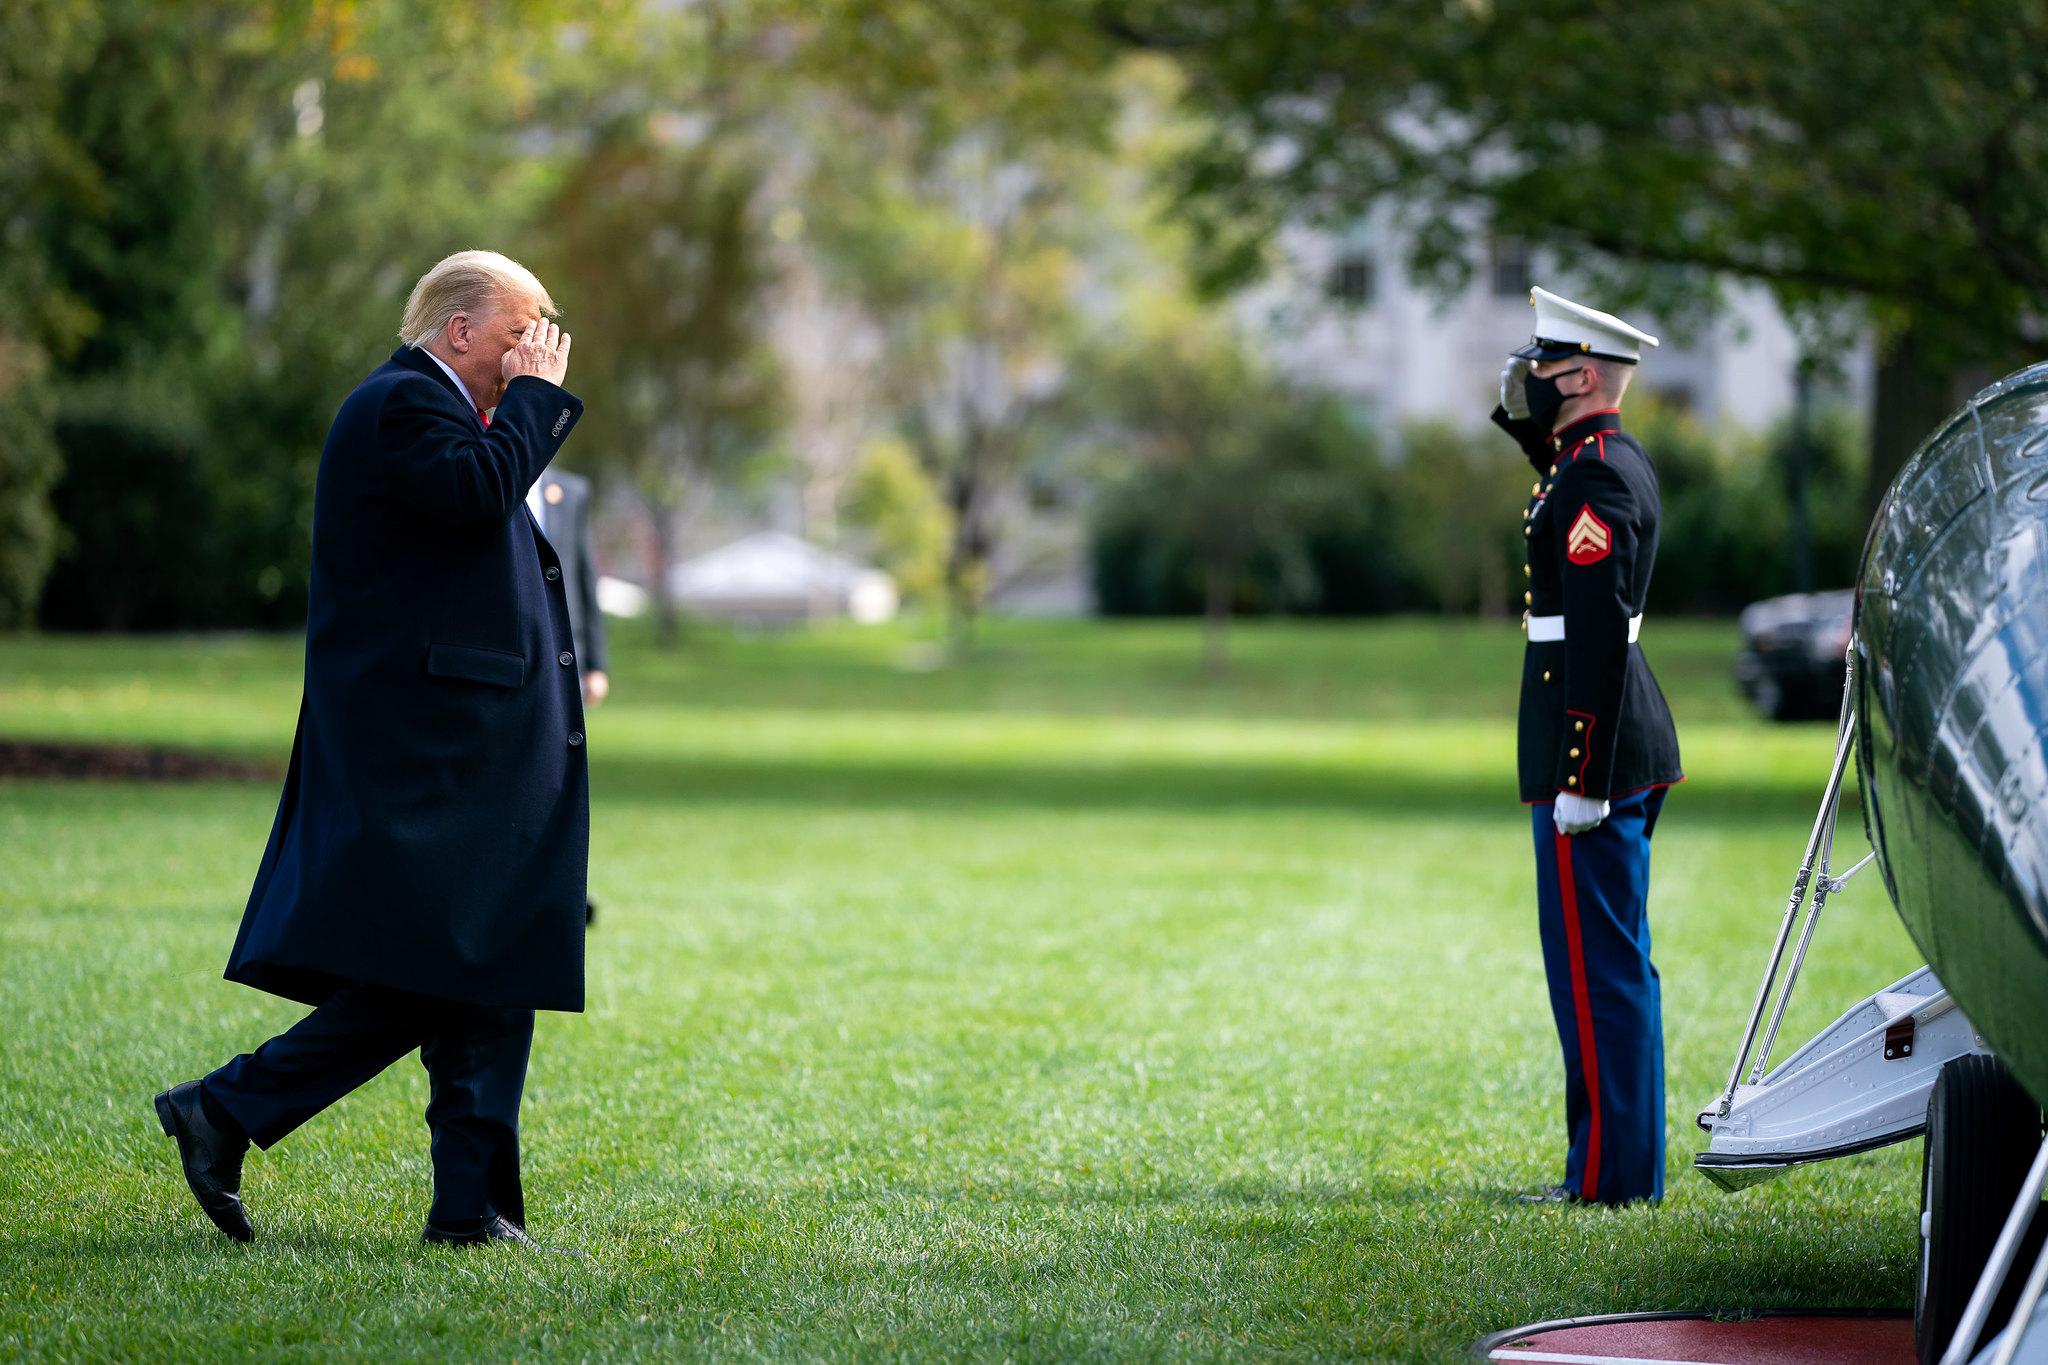 Ritiro Usa dall'Afghanistan? Ecco chi si oppone a Trump